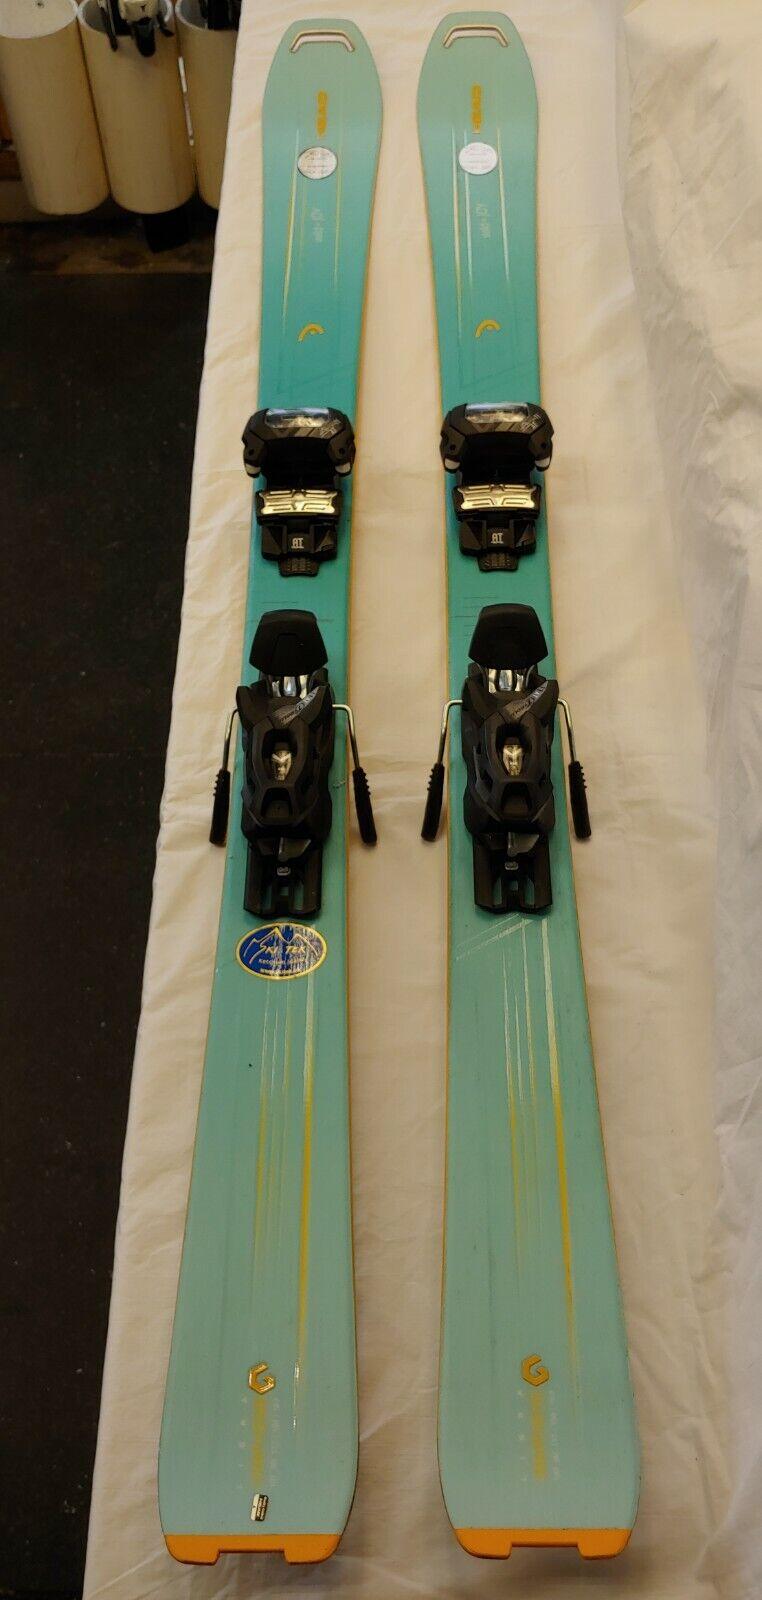 2017 2018 Head Wild Joy damen Ski 158cm with Tyrolia Attack 11 AT Demo Bindings